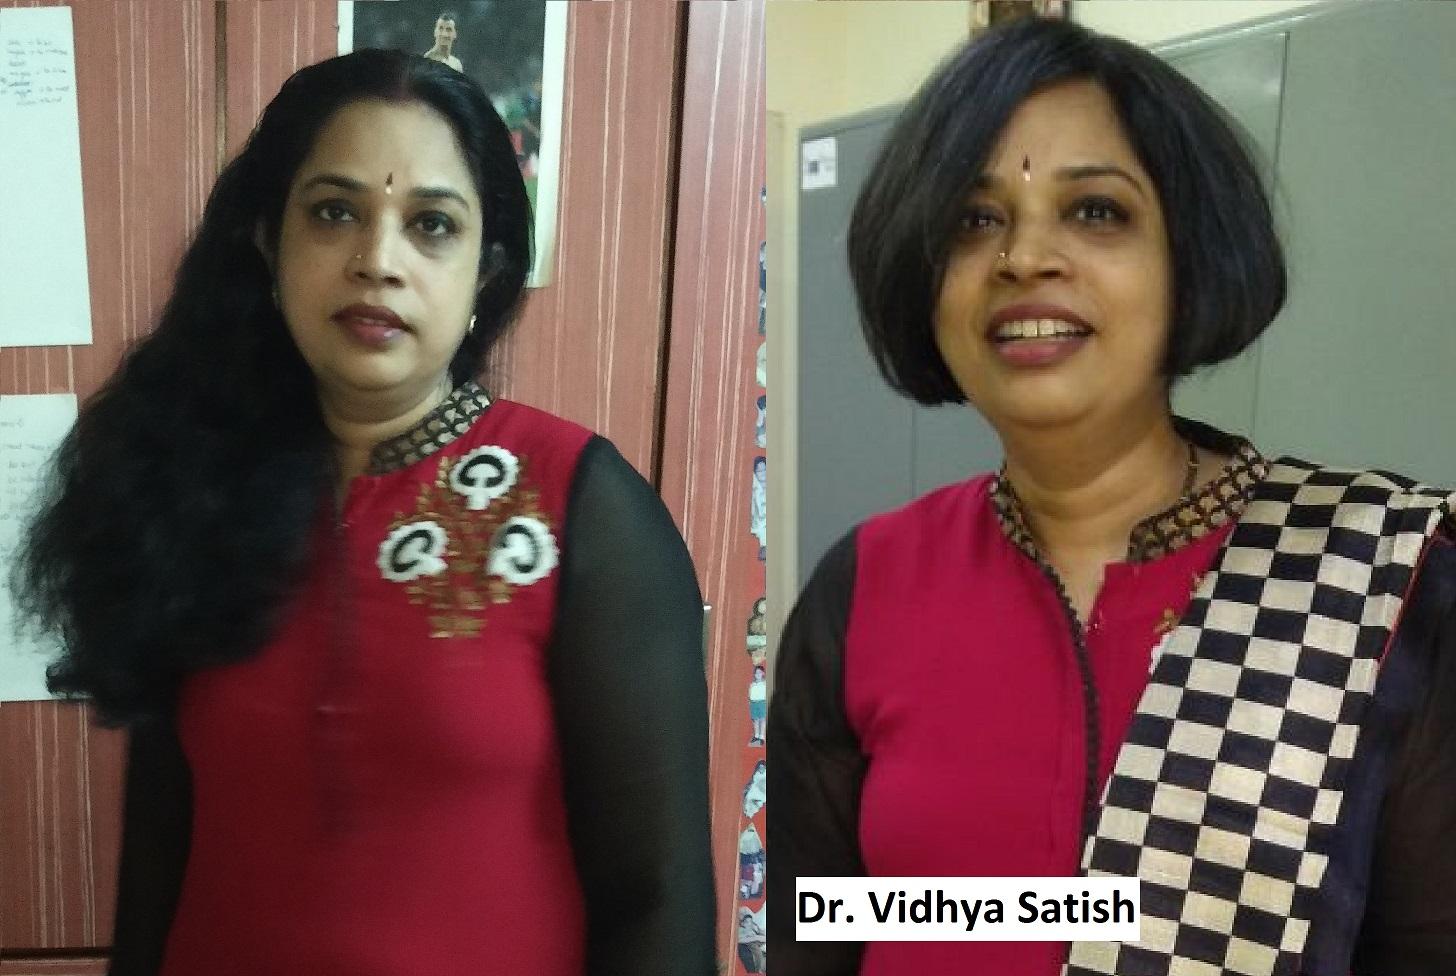 Dr. Vidhya Satish a